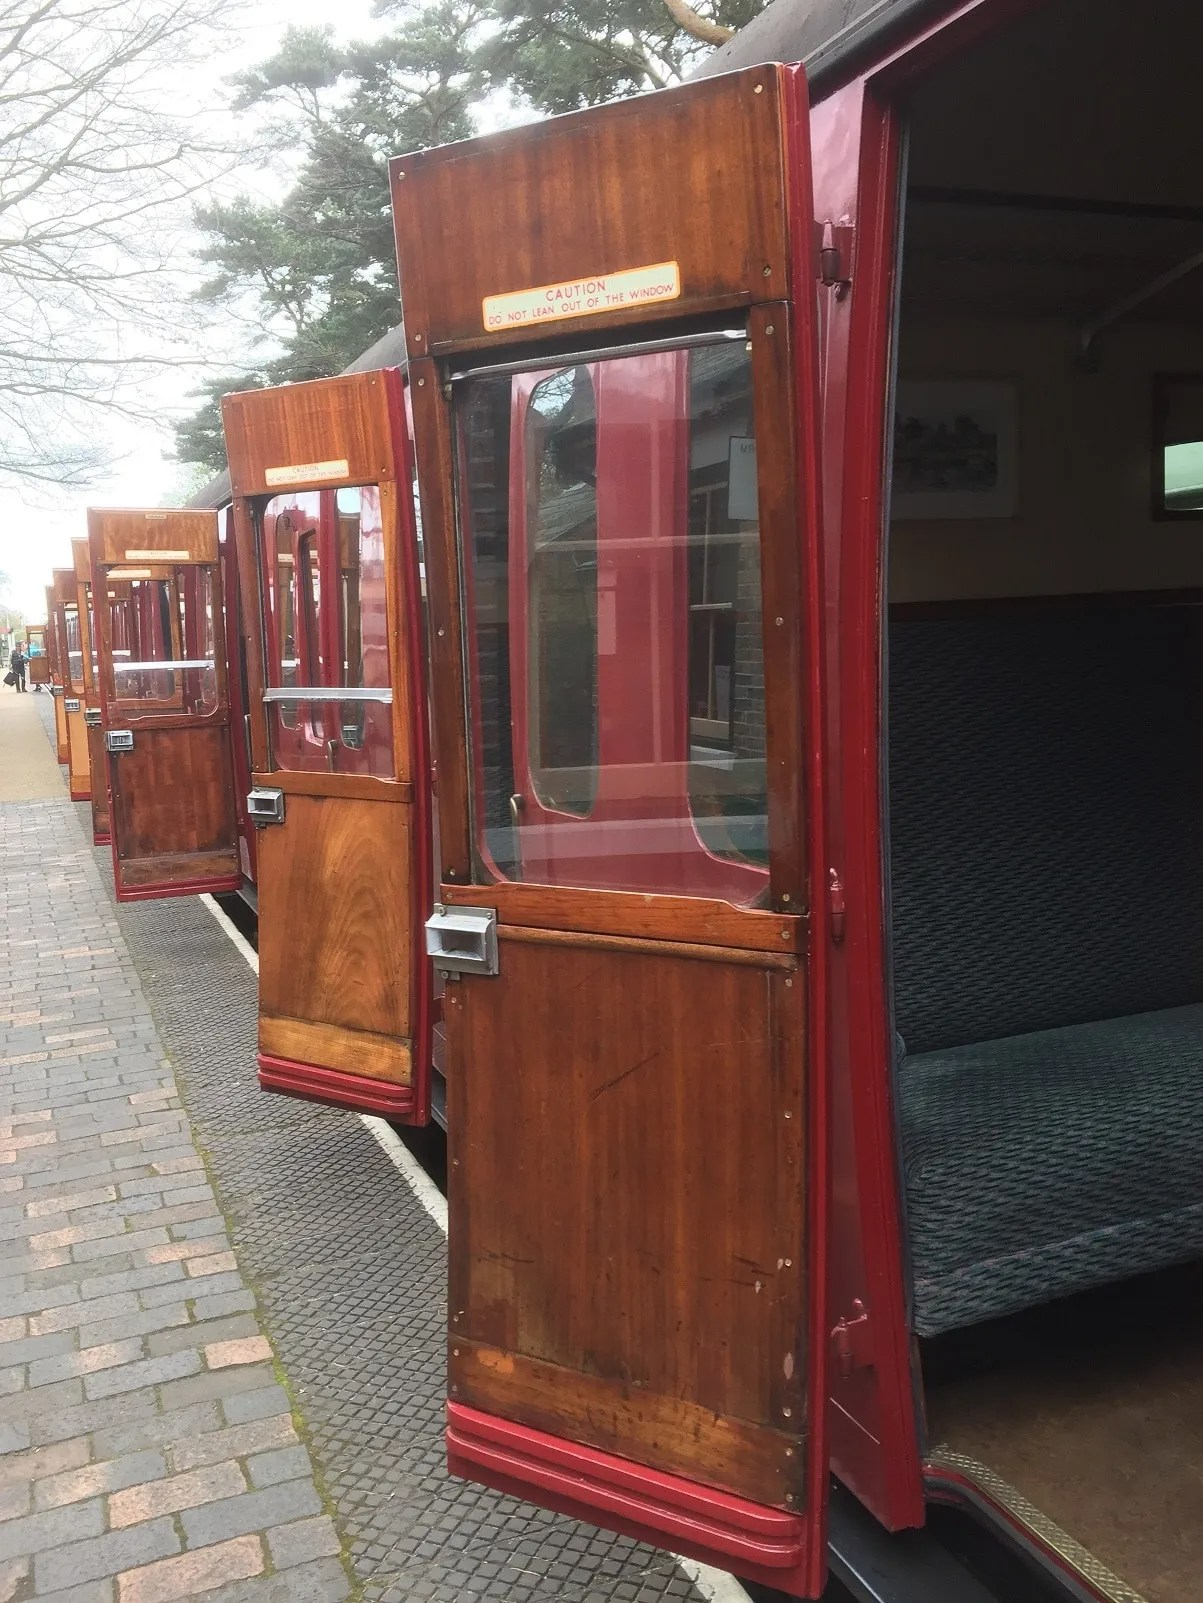 BR Mark 1 suburban coach set at Holt station on the North Norfolk Railway